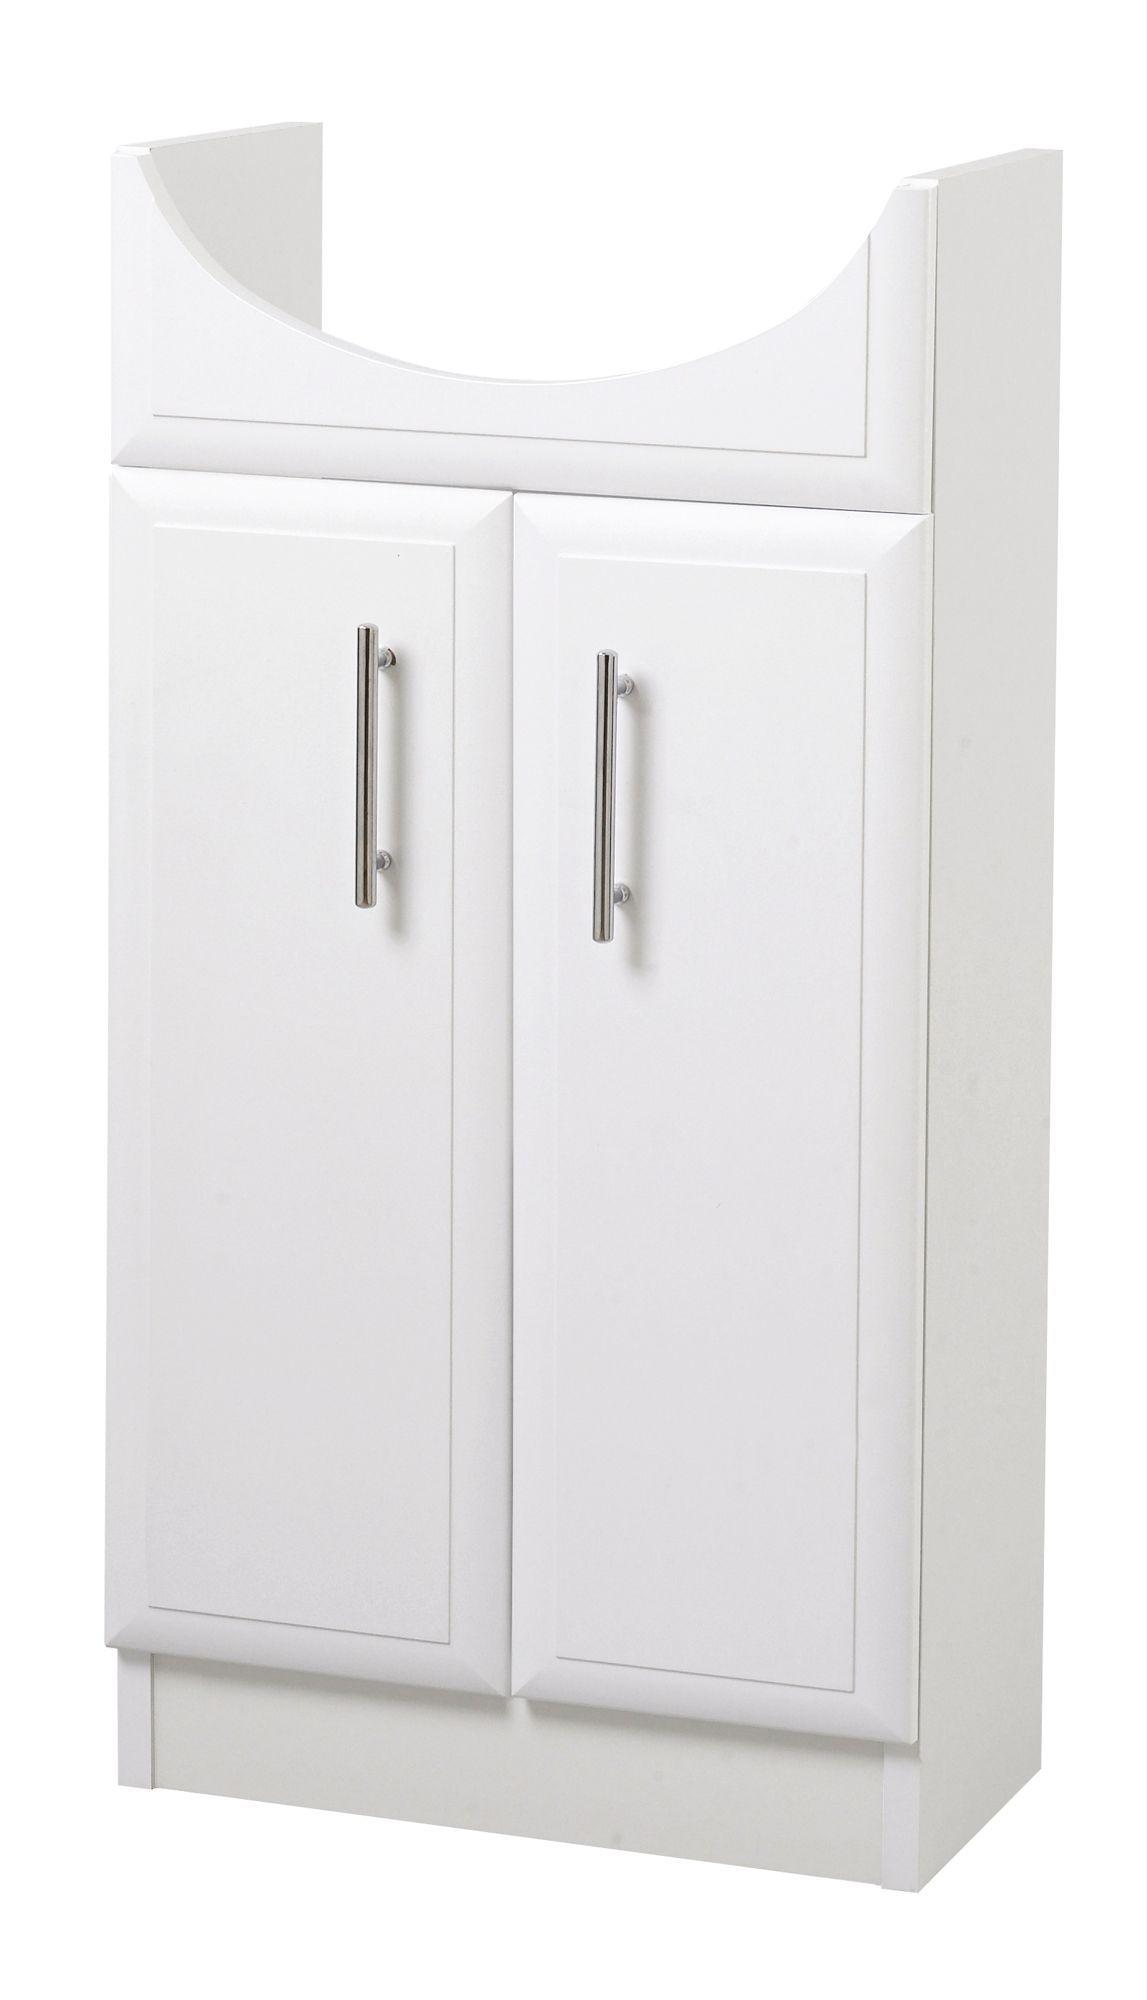 B&Q White Vanity slimline cloakroom unit | Departments ...